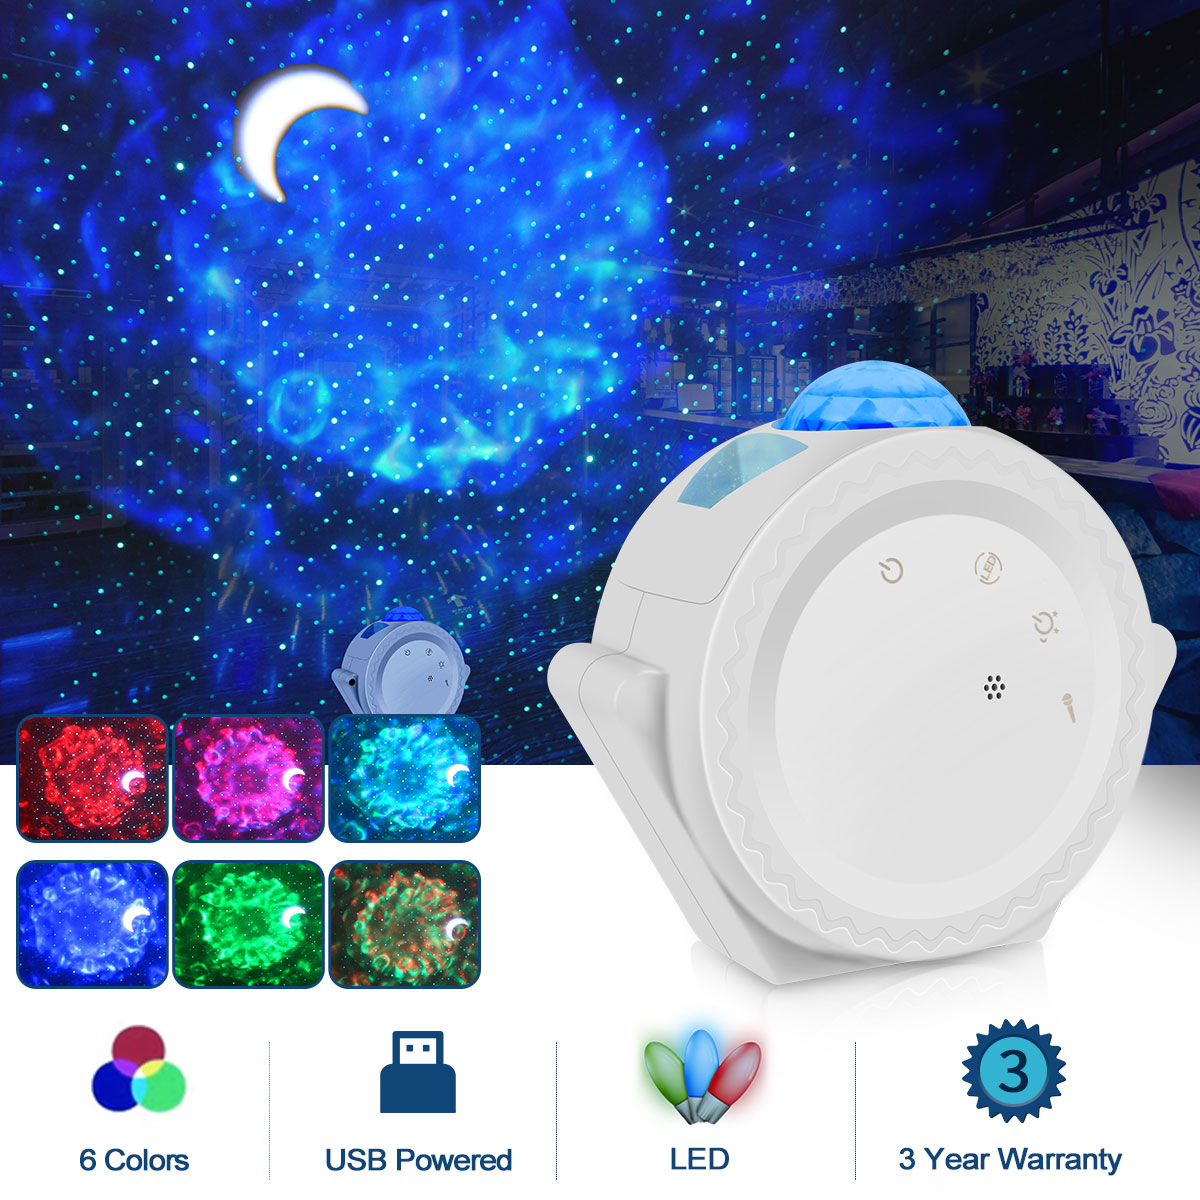 LED Starry Sky Projector Light 360 Degree Rotation Nebula Cloud Night Light 6 Colors Ocean Waving Light Christmas Gift Navidad